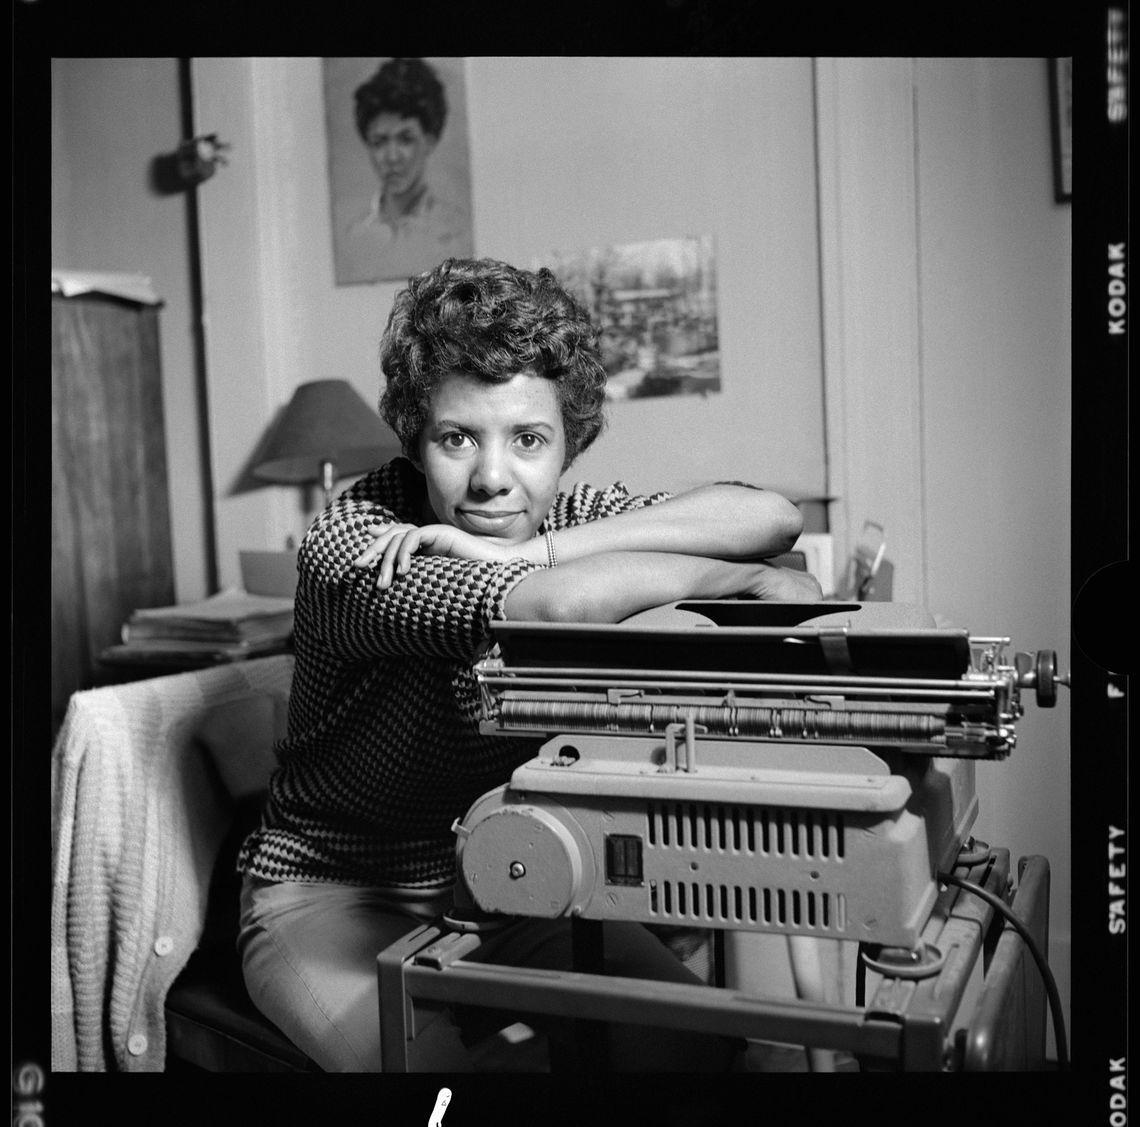 sighted eyesfeeling heart lhat typewriter key image